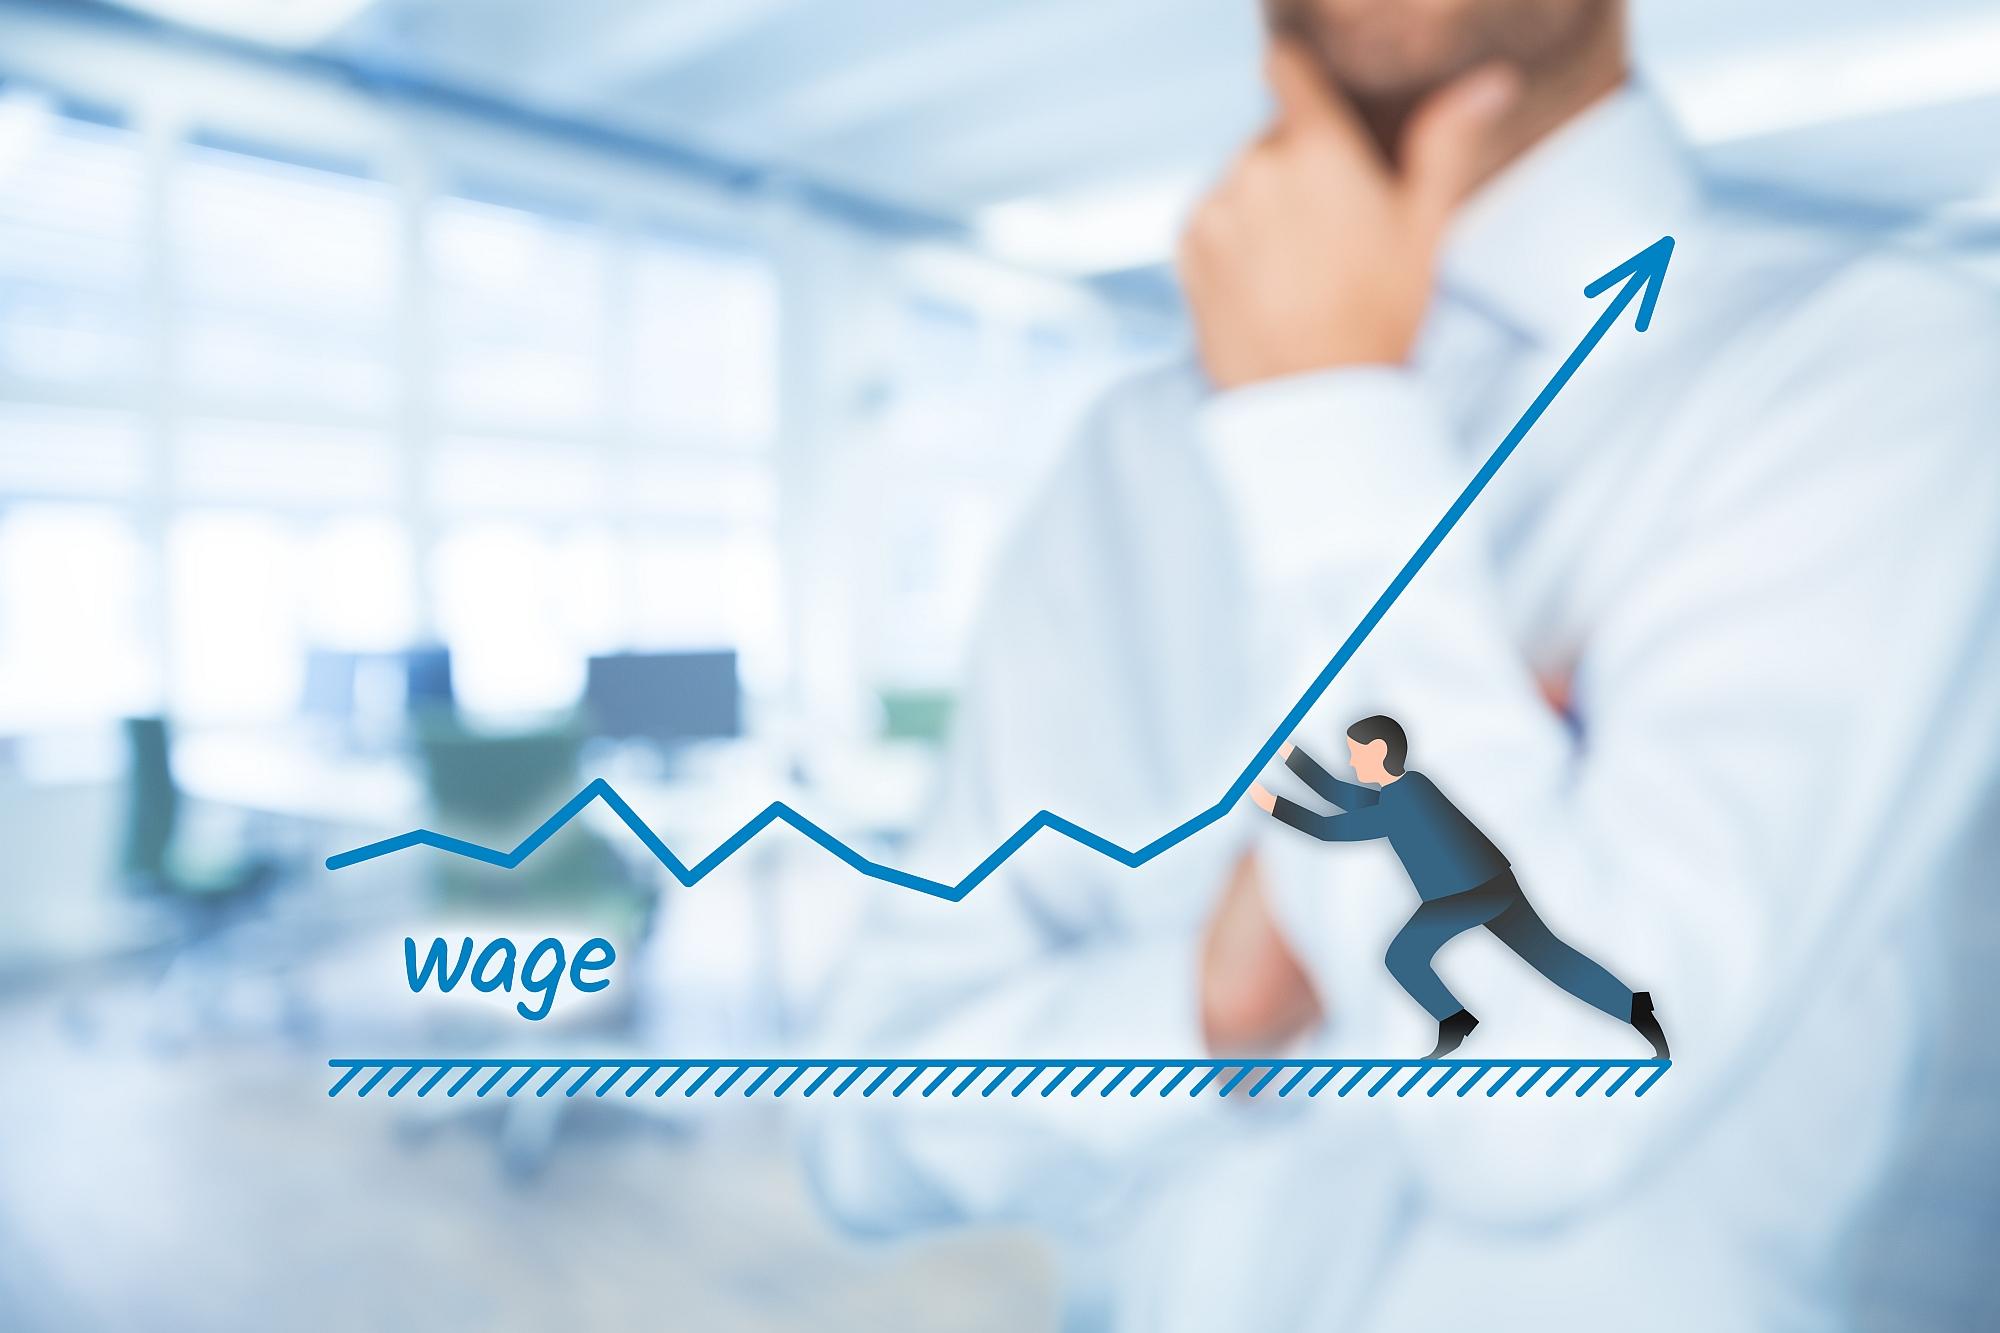 wage_growth_2.jpg